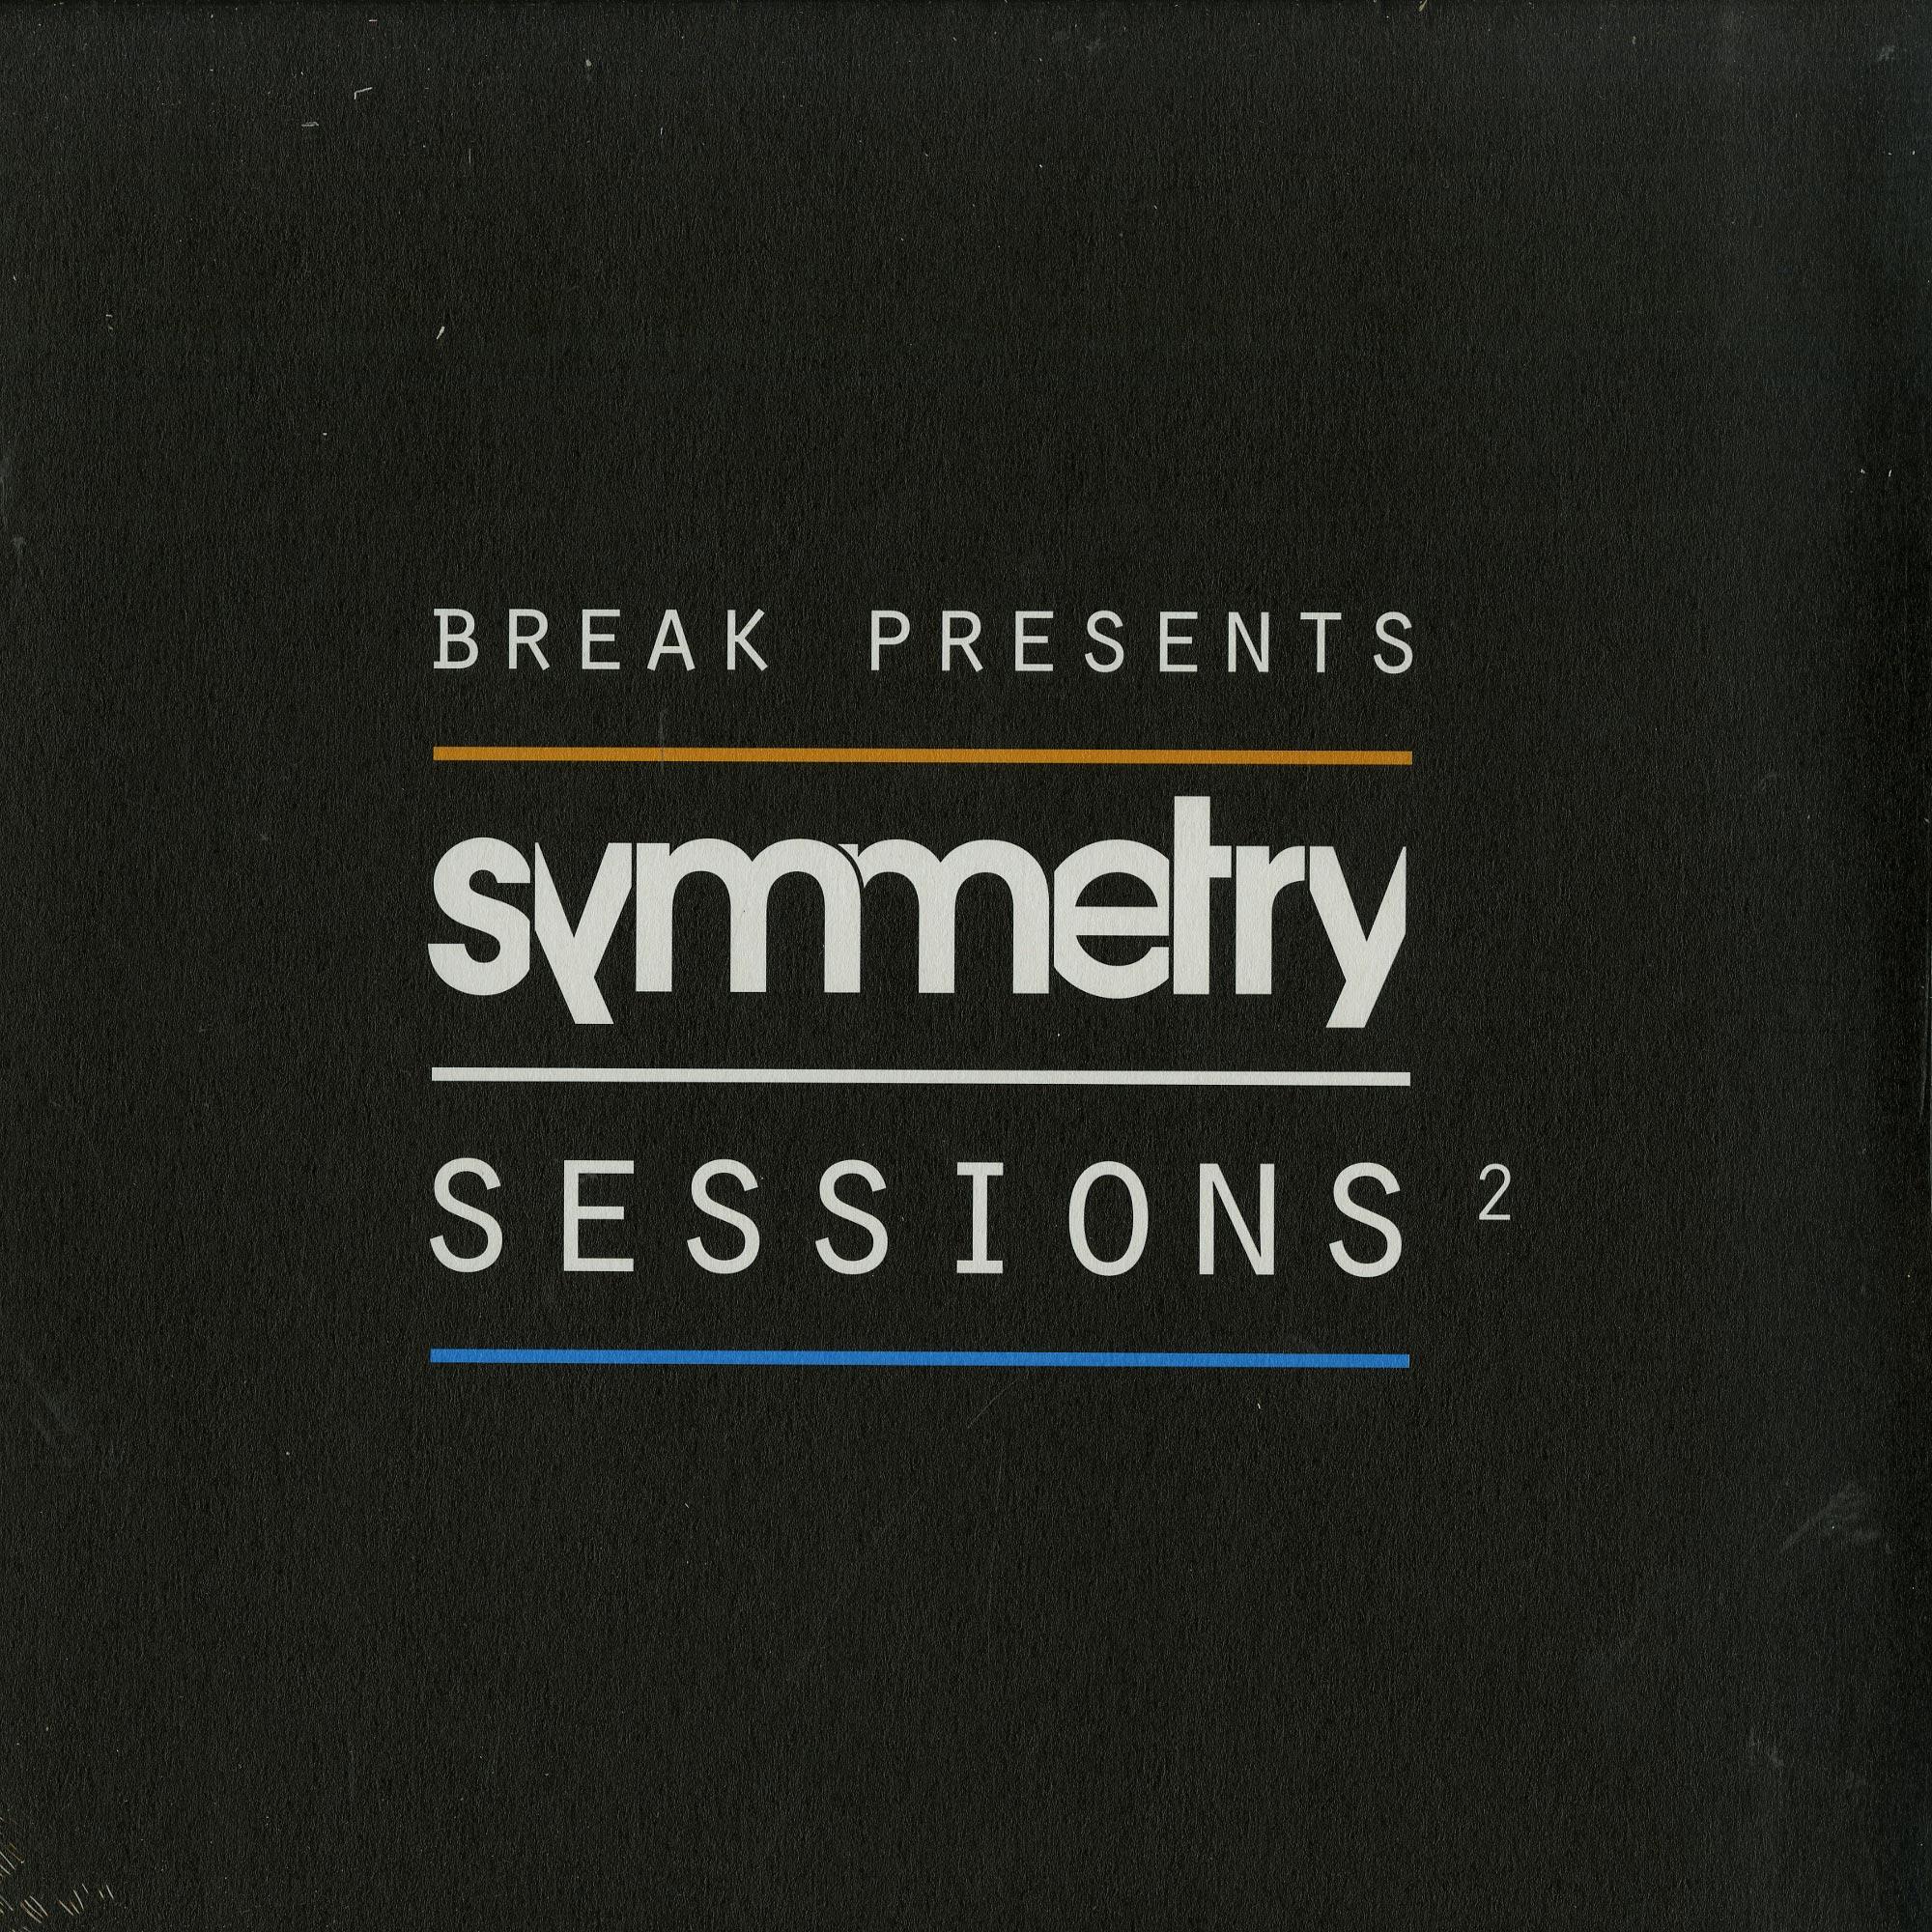 Break - SYMMETRY SESSIONS 2